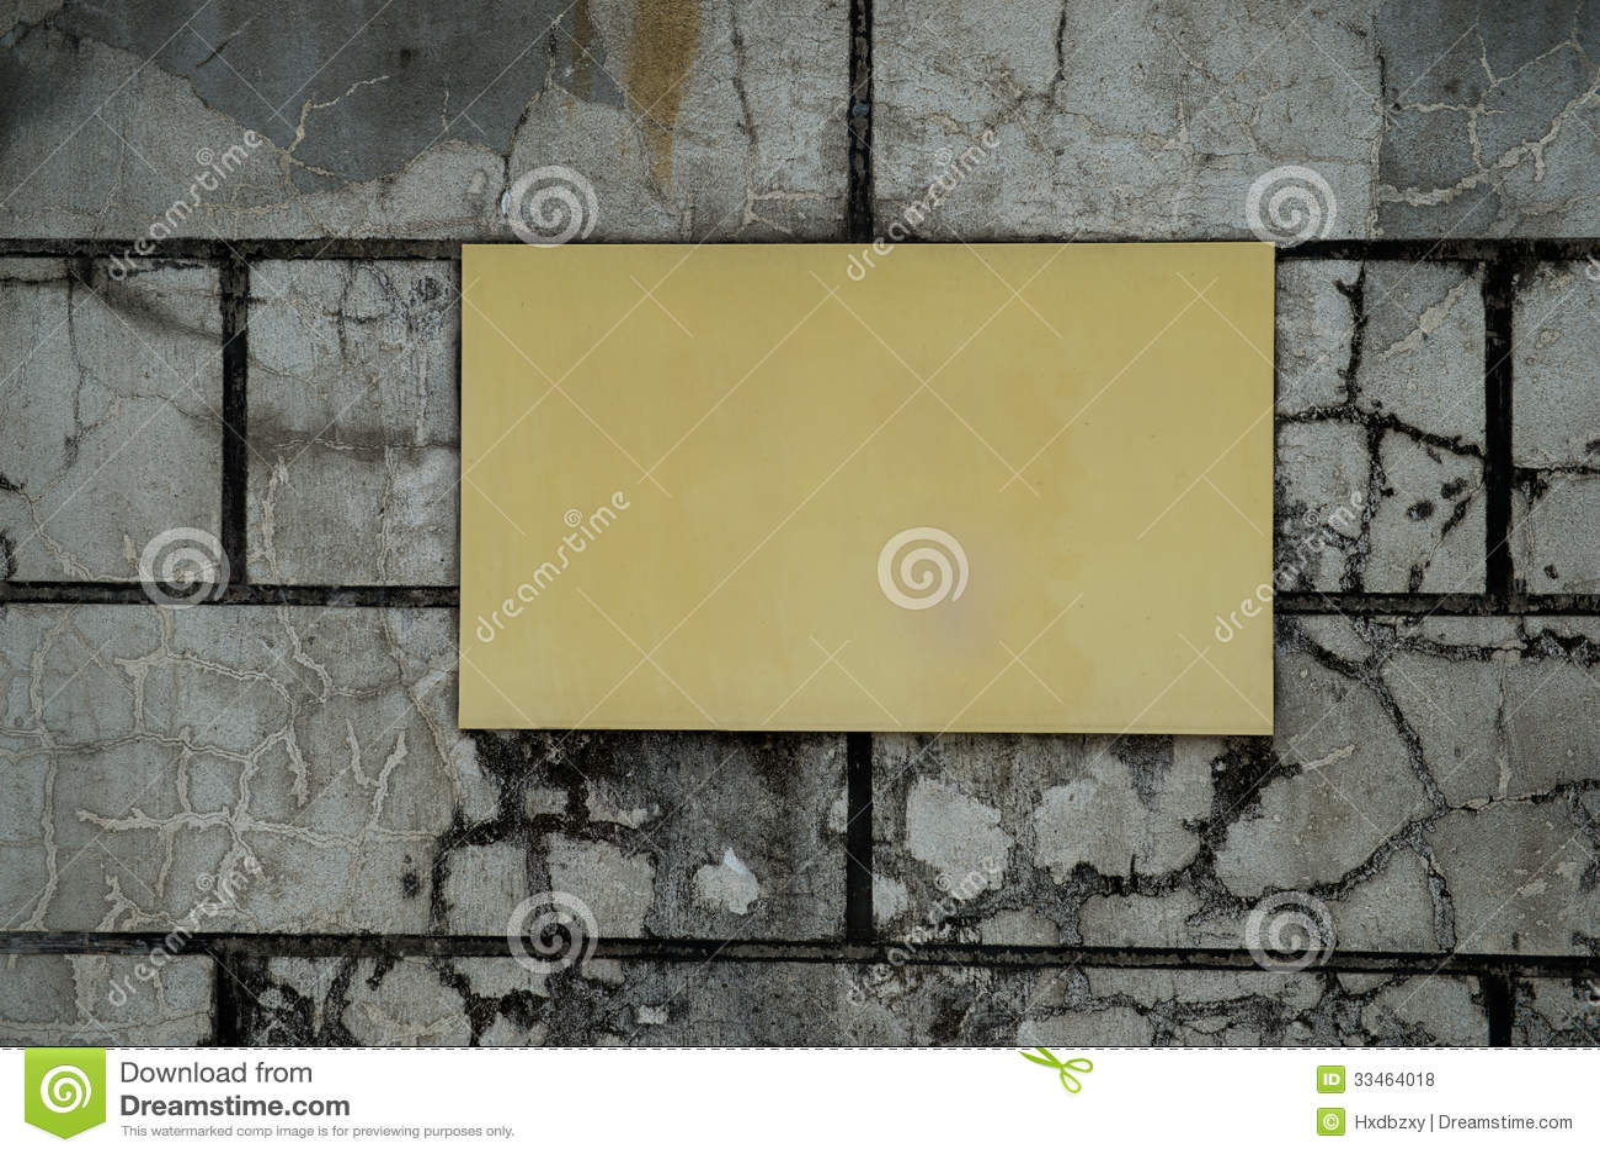 Plastic Cement Board : Concrete wall stock photo image of empty aged plastic